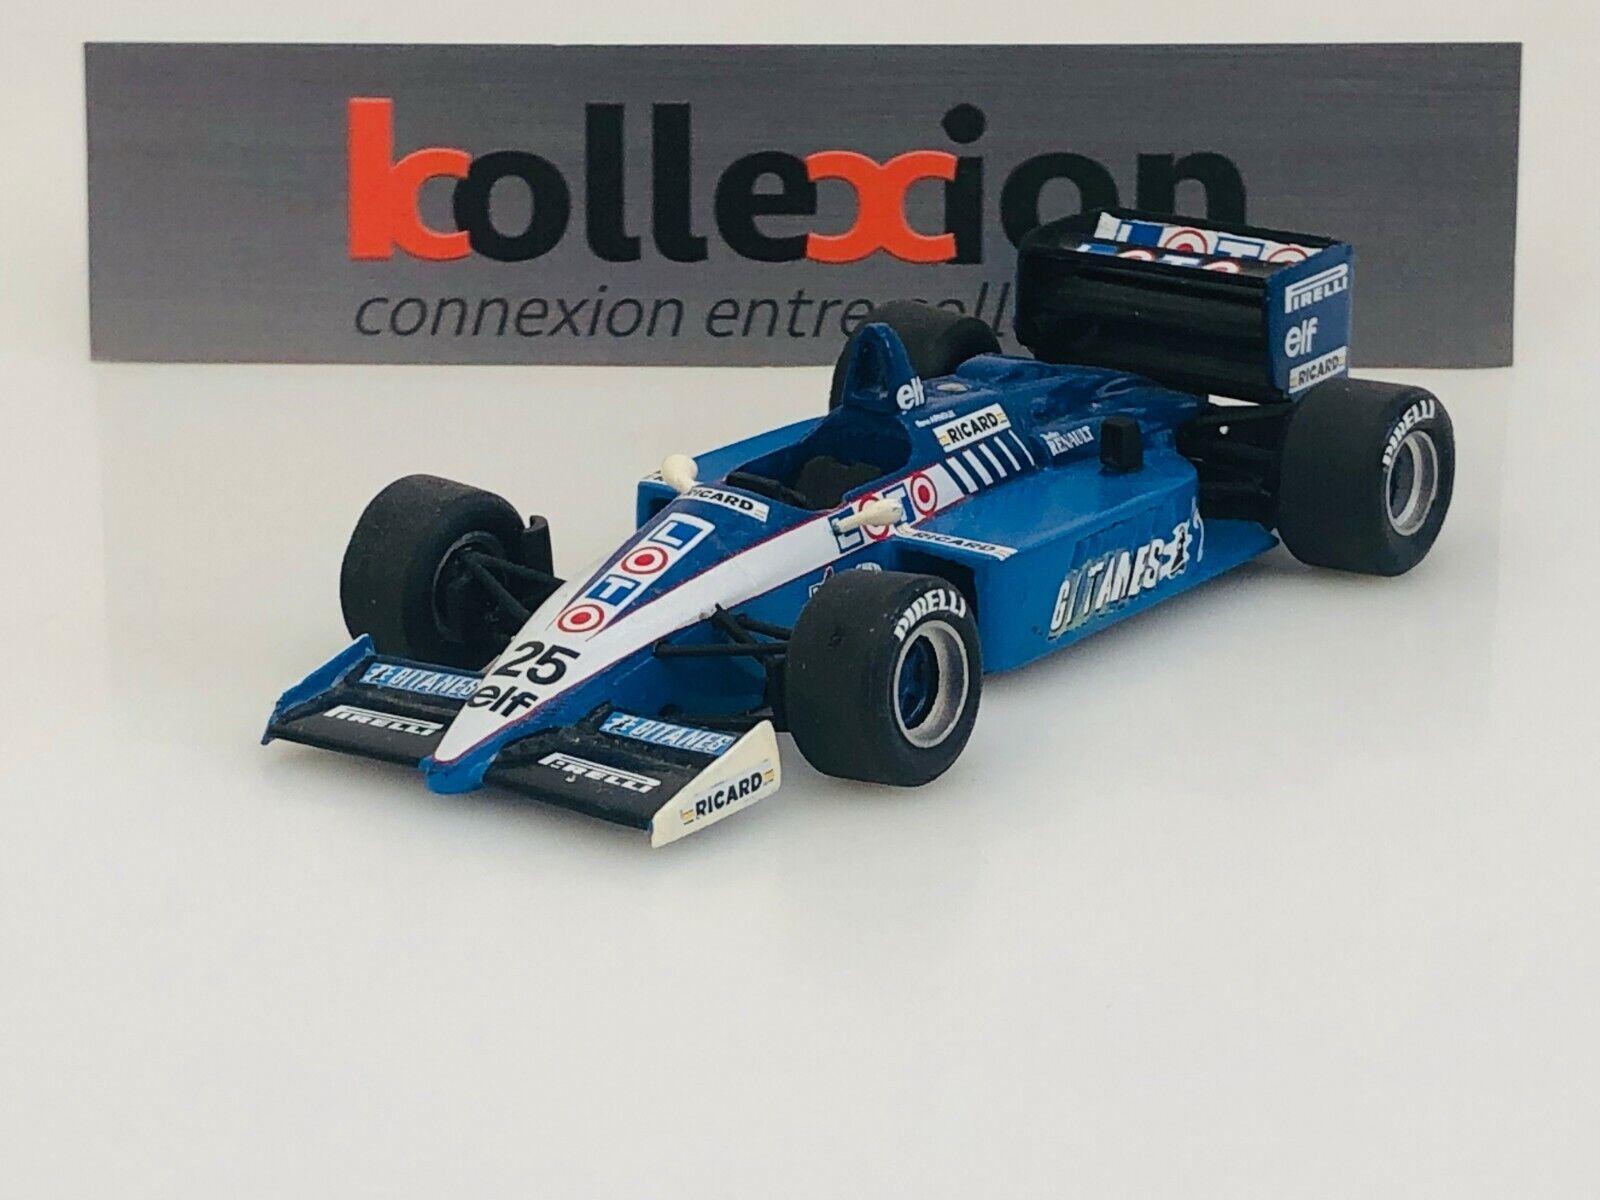 Merrikitlicher js27 Renault n - 25 25 25 gitanes   loto GP F1 Mónaco 1986 R. Arnold 1.43 925